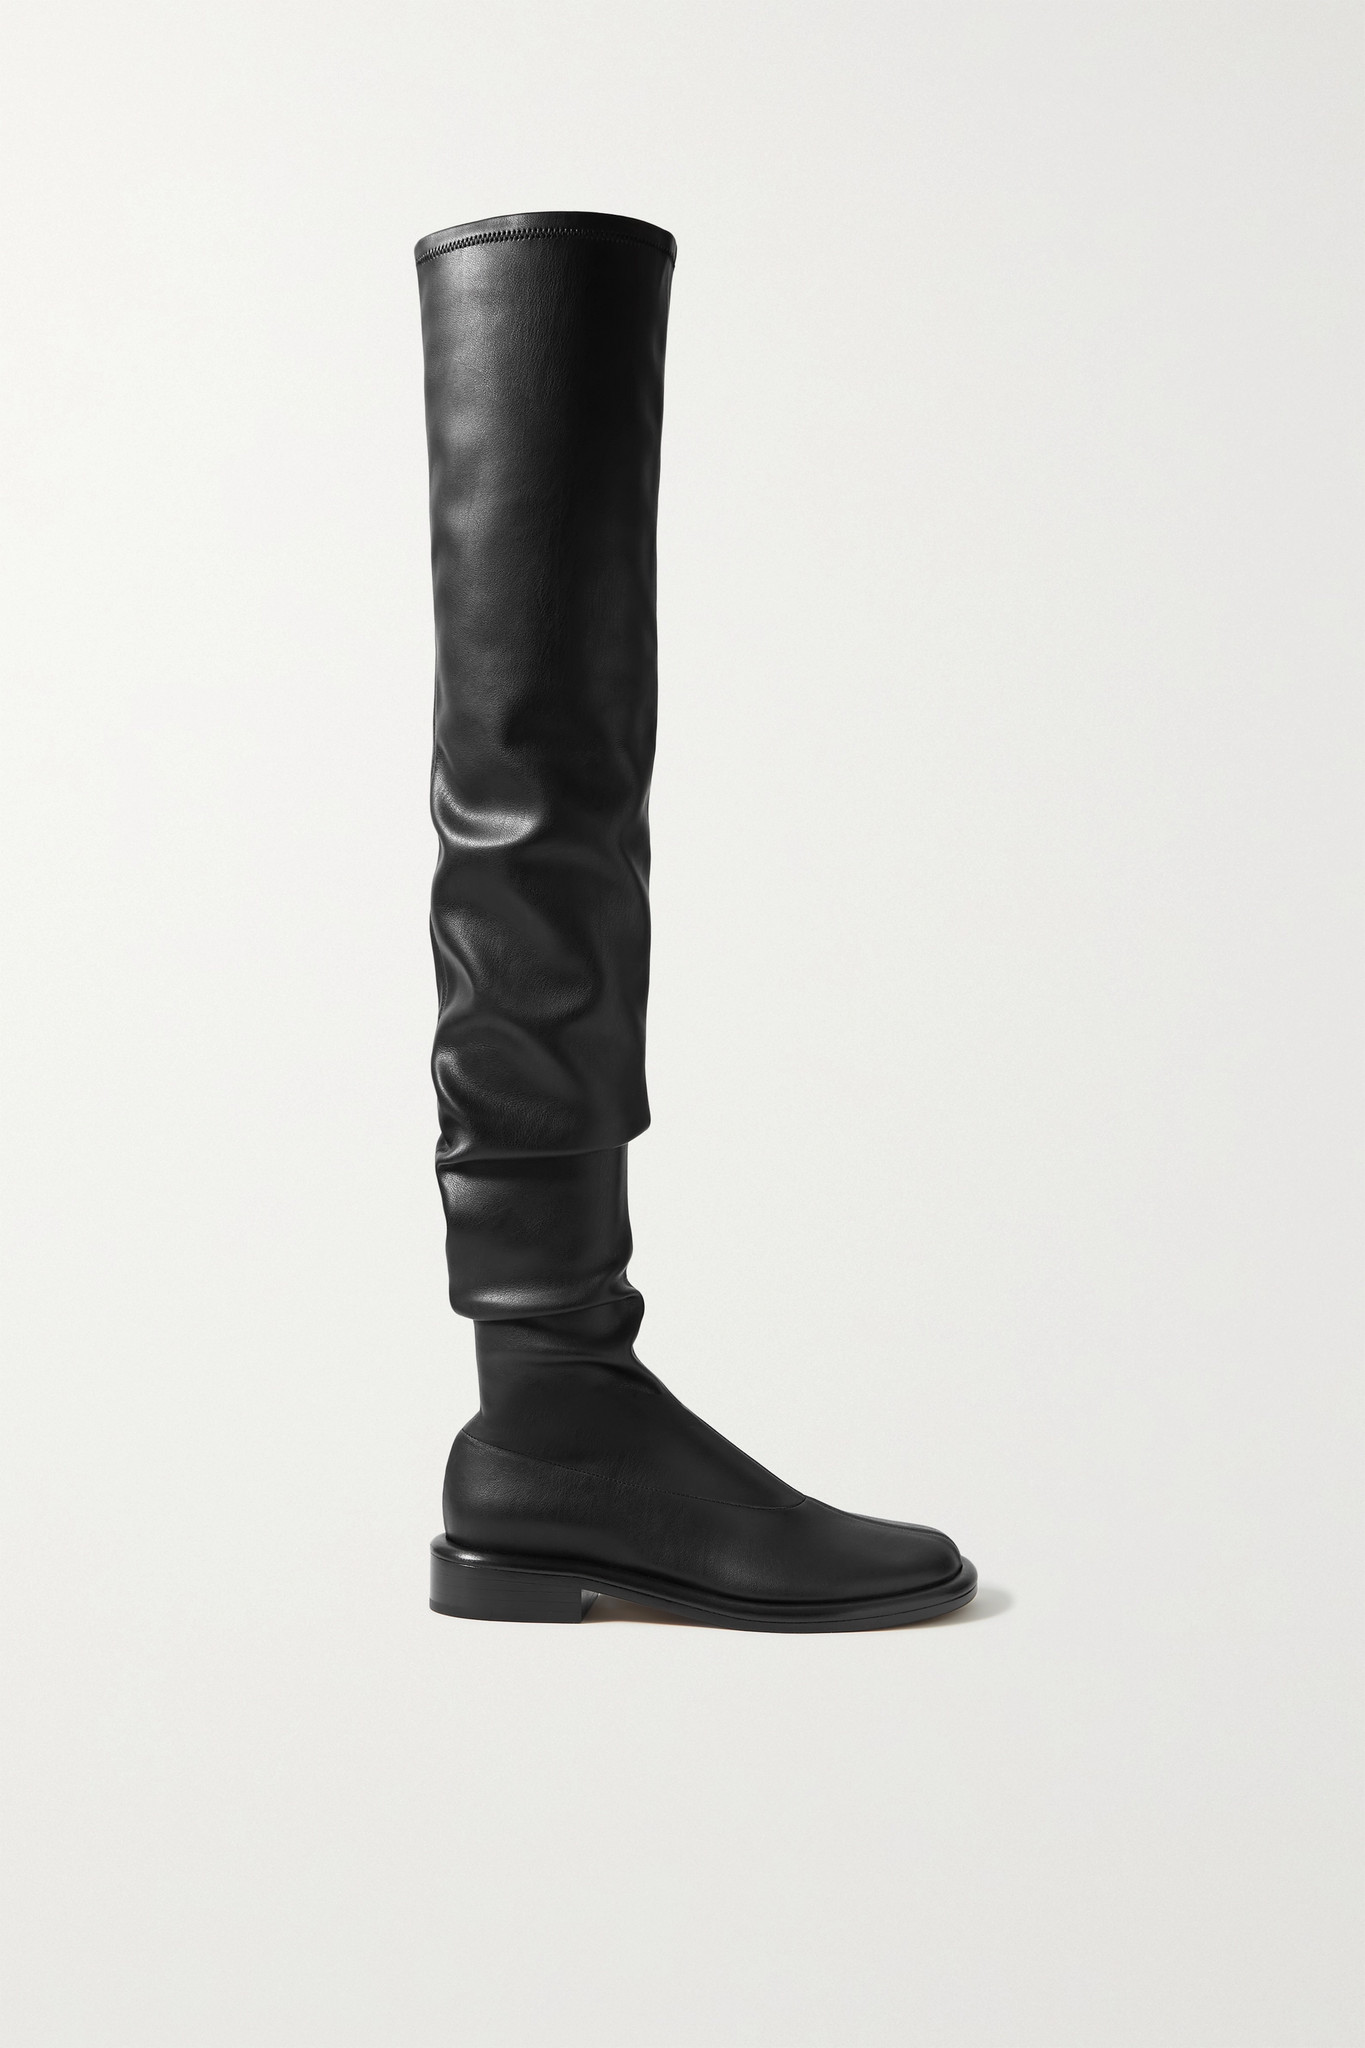 PROENZA SCHOULER - Boyd 皮革过膝长靴 - 黑色 - IT37.5